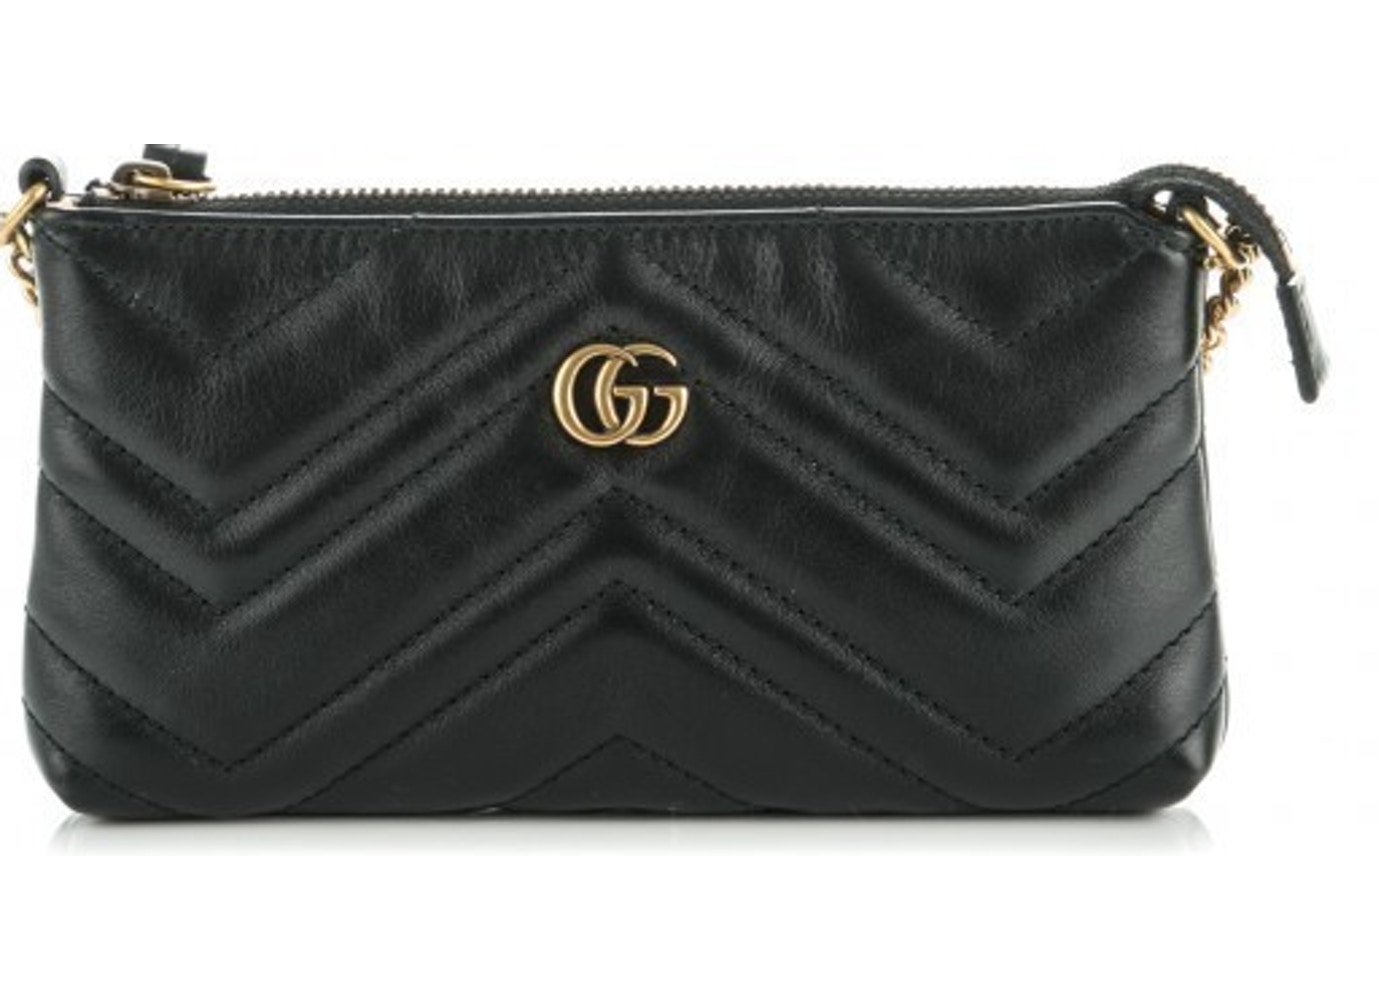 bb8bab4ce2b259 Gucci Marmont Chain Bag Matelasse Mini. Matelasse Mini